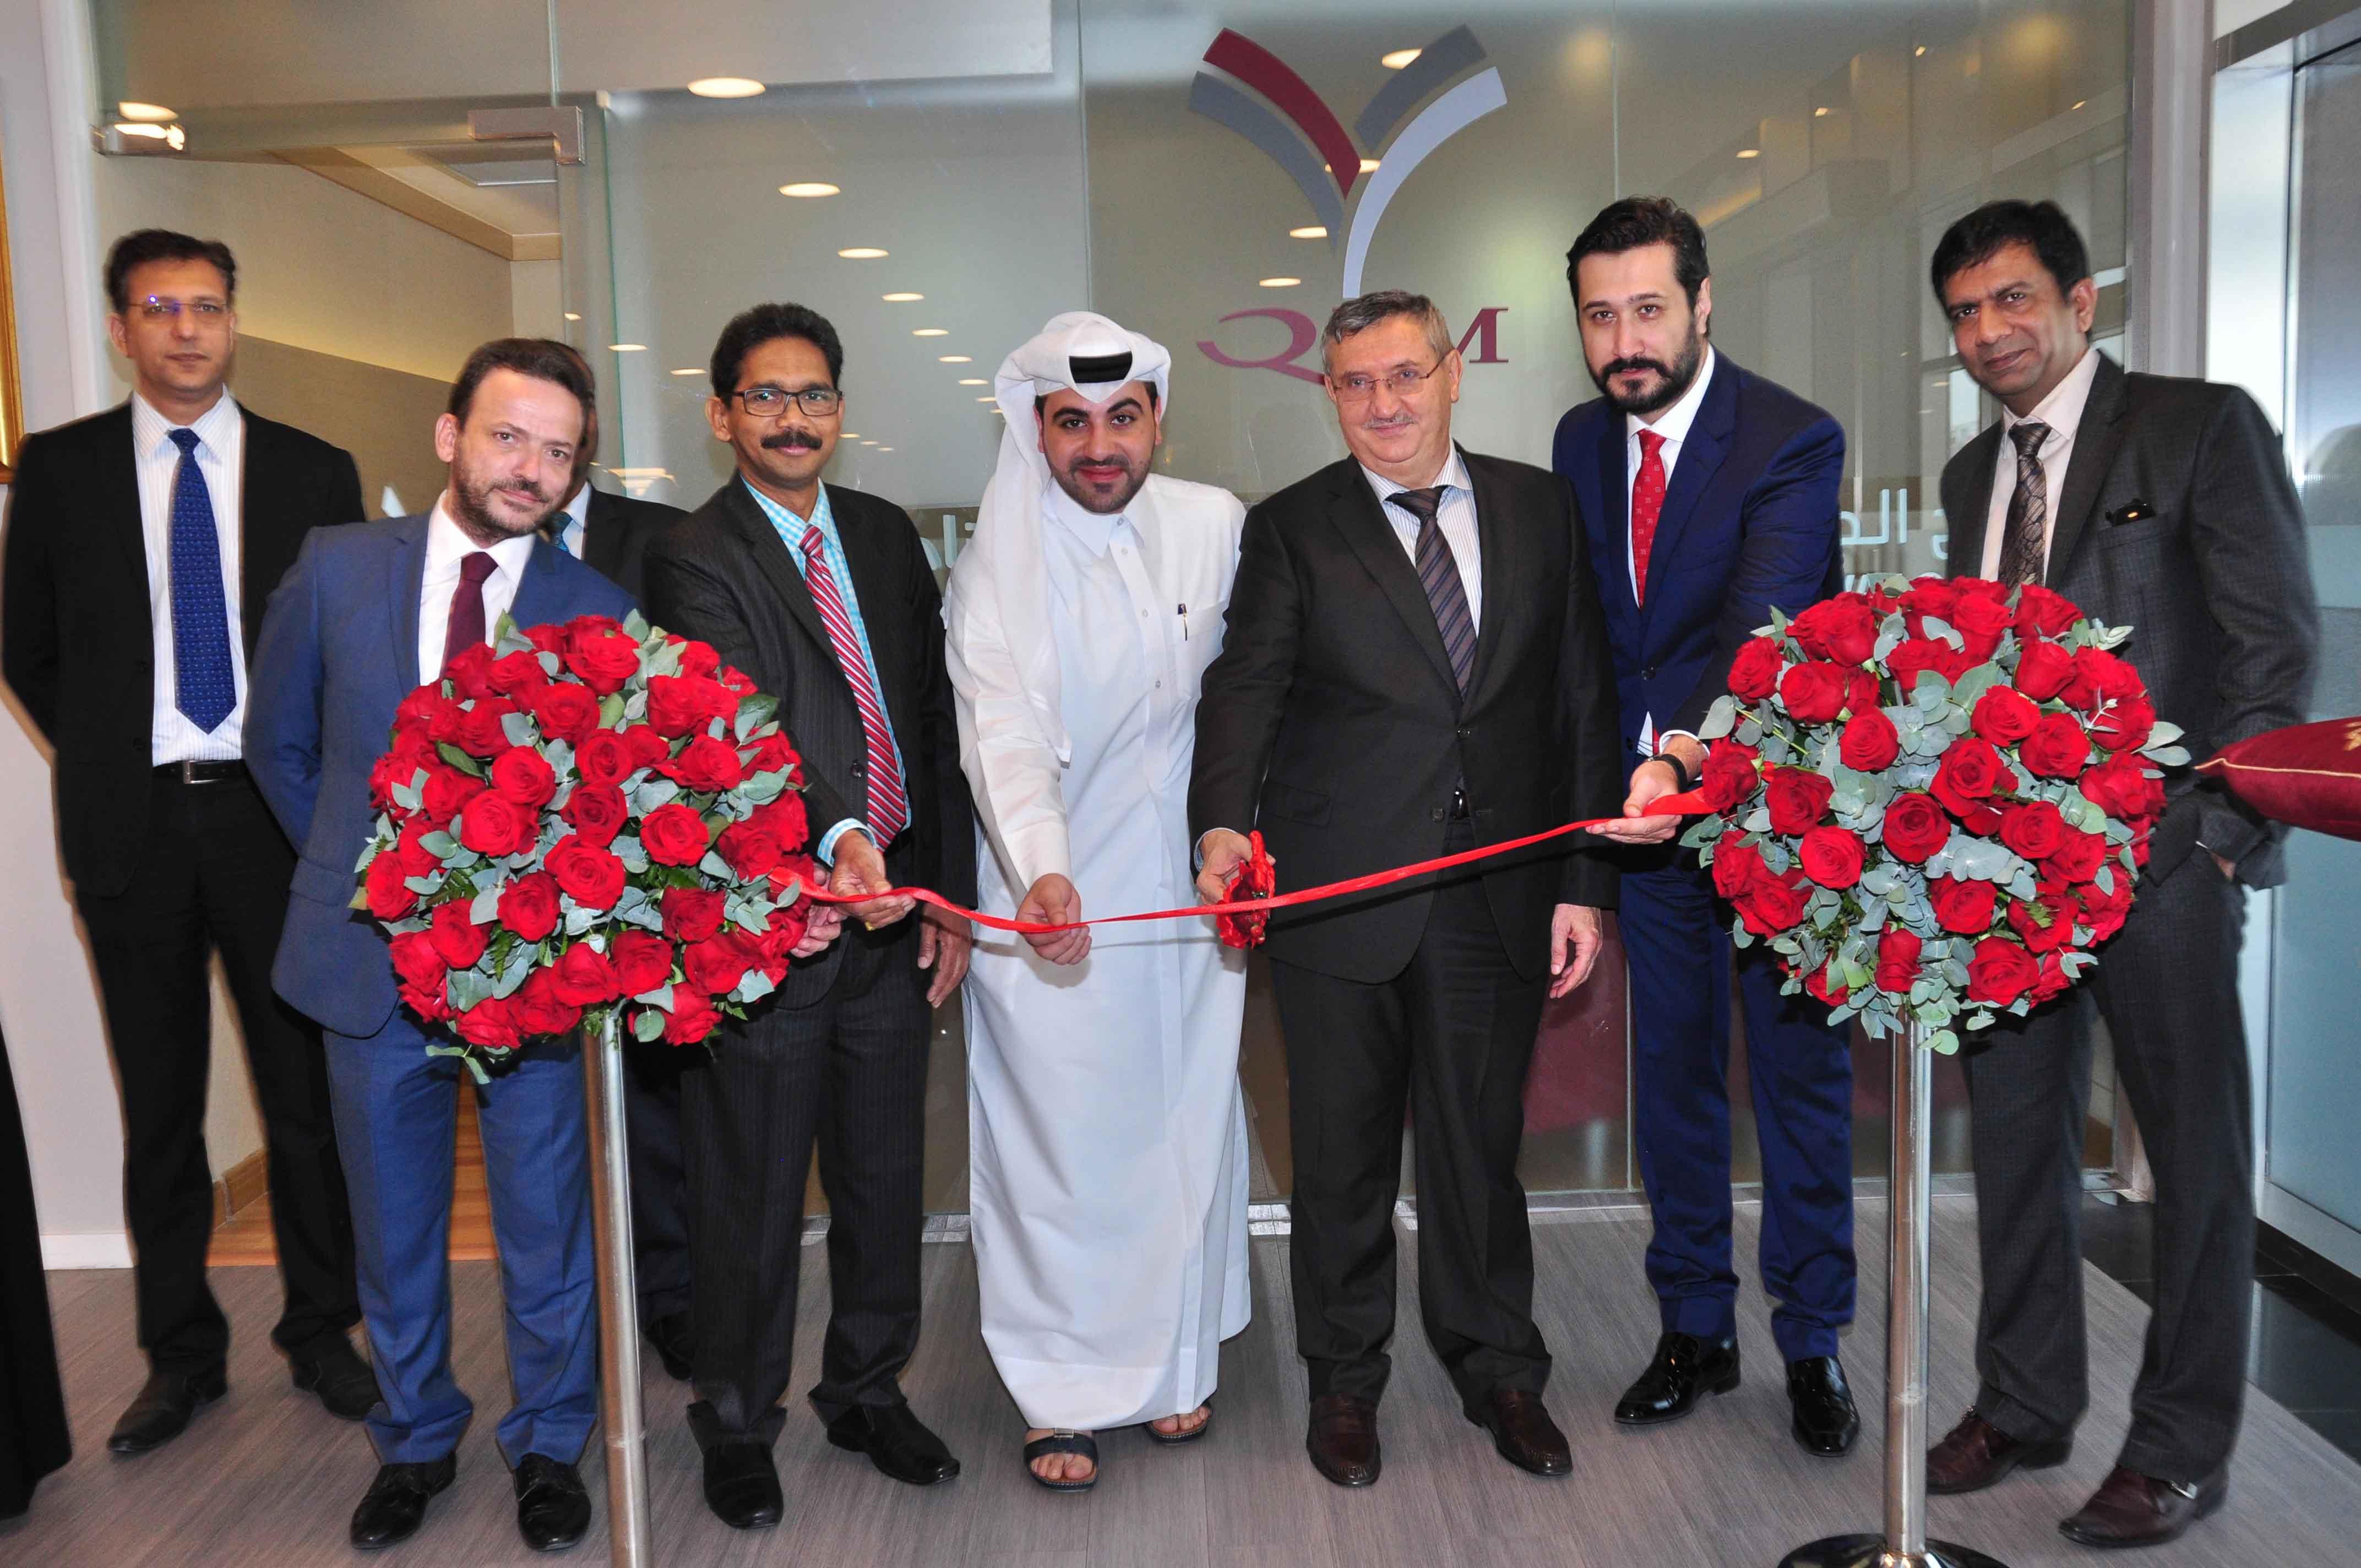 QLM-Lounge-inauguration-at-Turkish-Hospital Qlm Medical Claim Form on